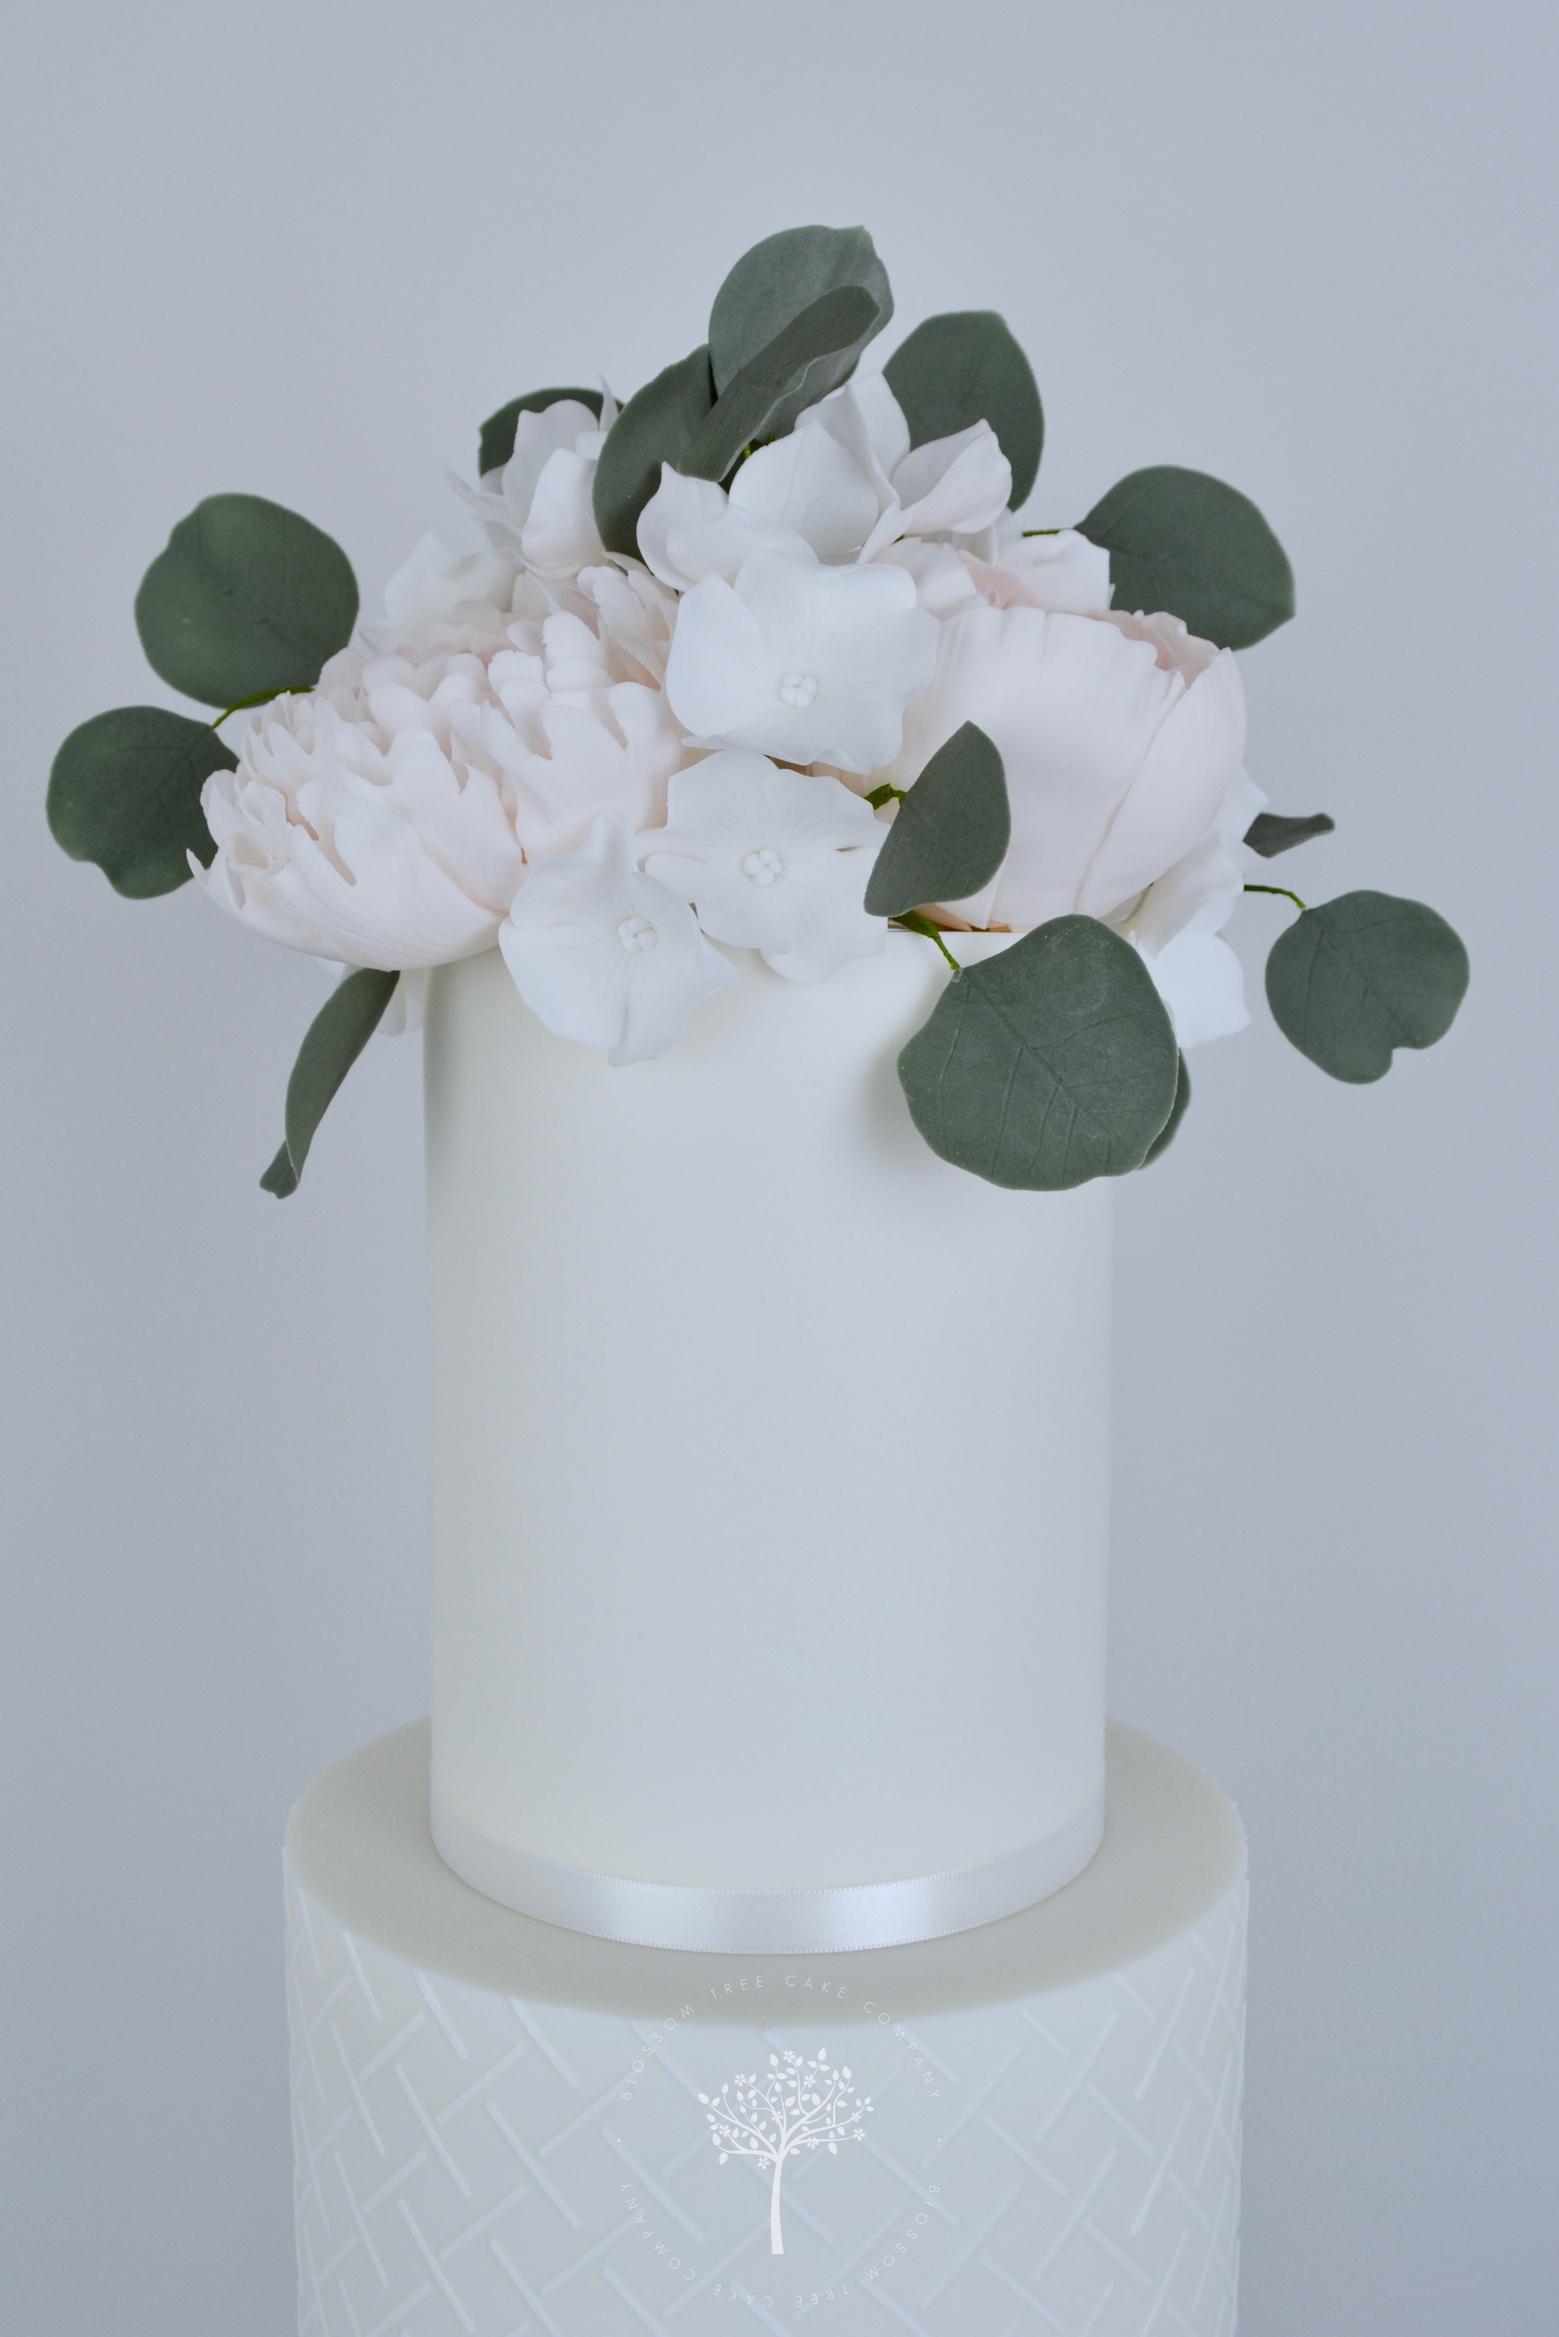 Peony and Magnolia Wedding Cake by Blossom Tree Cake Company Harrogate North Yorkshire - top sugar flowers.jpg